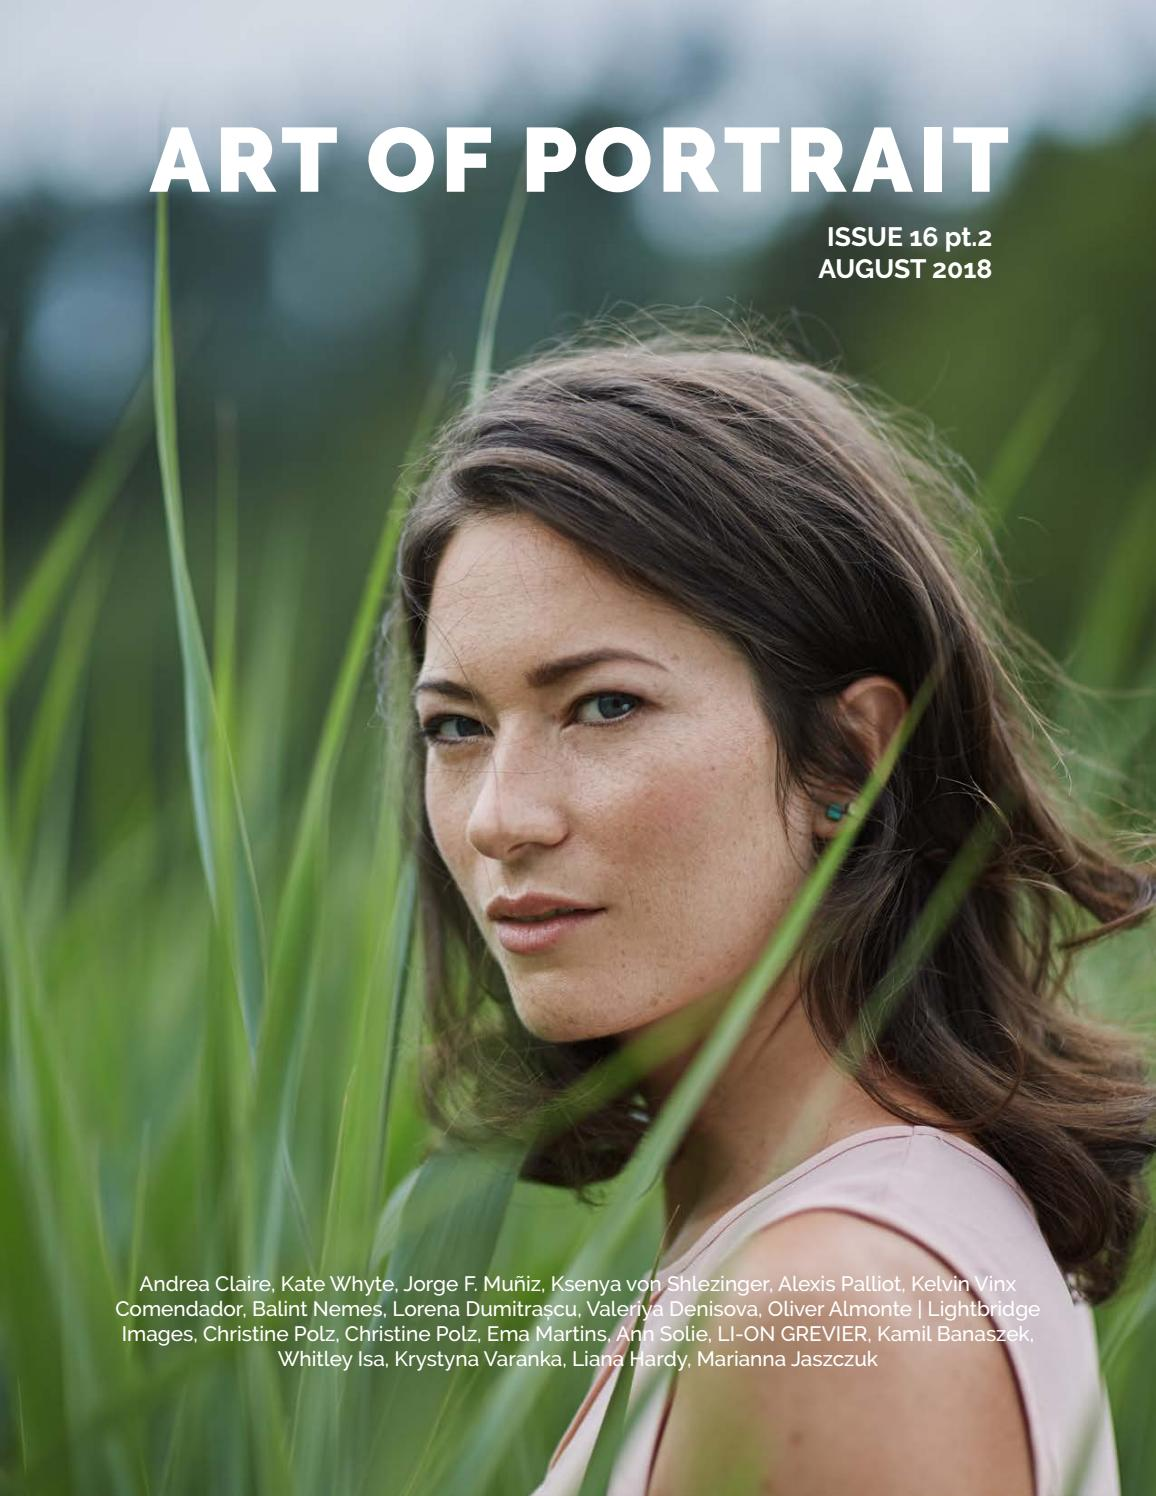 Angelina Muniz Nova art of portrait - issue 16 pt.2art of portrait magazine